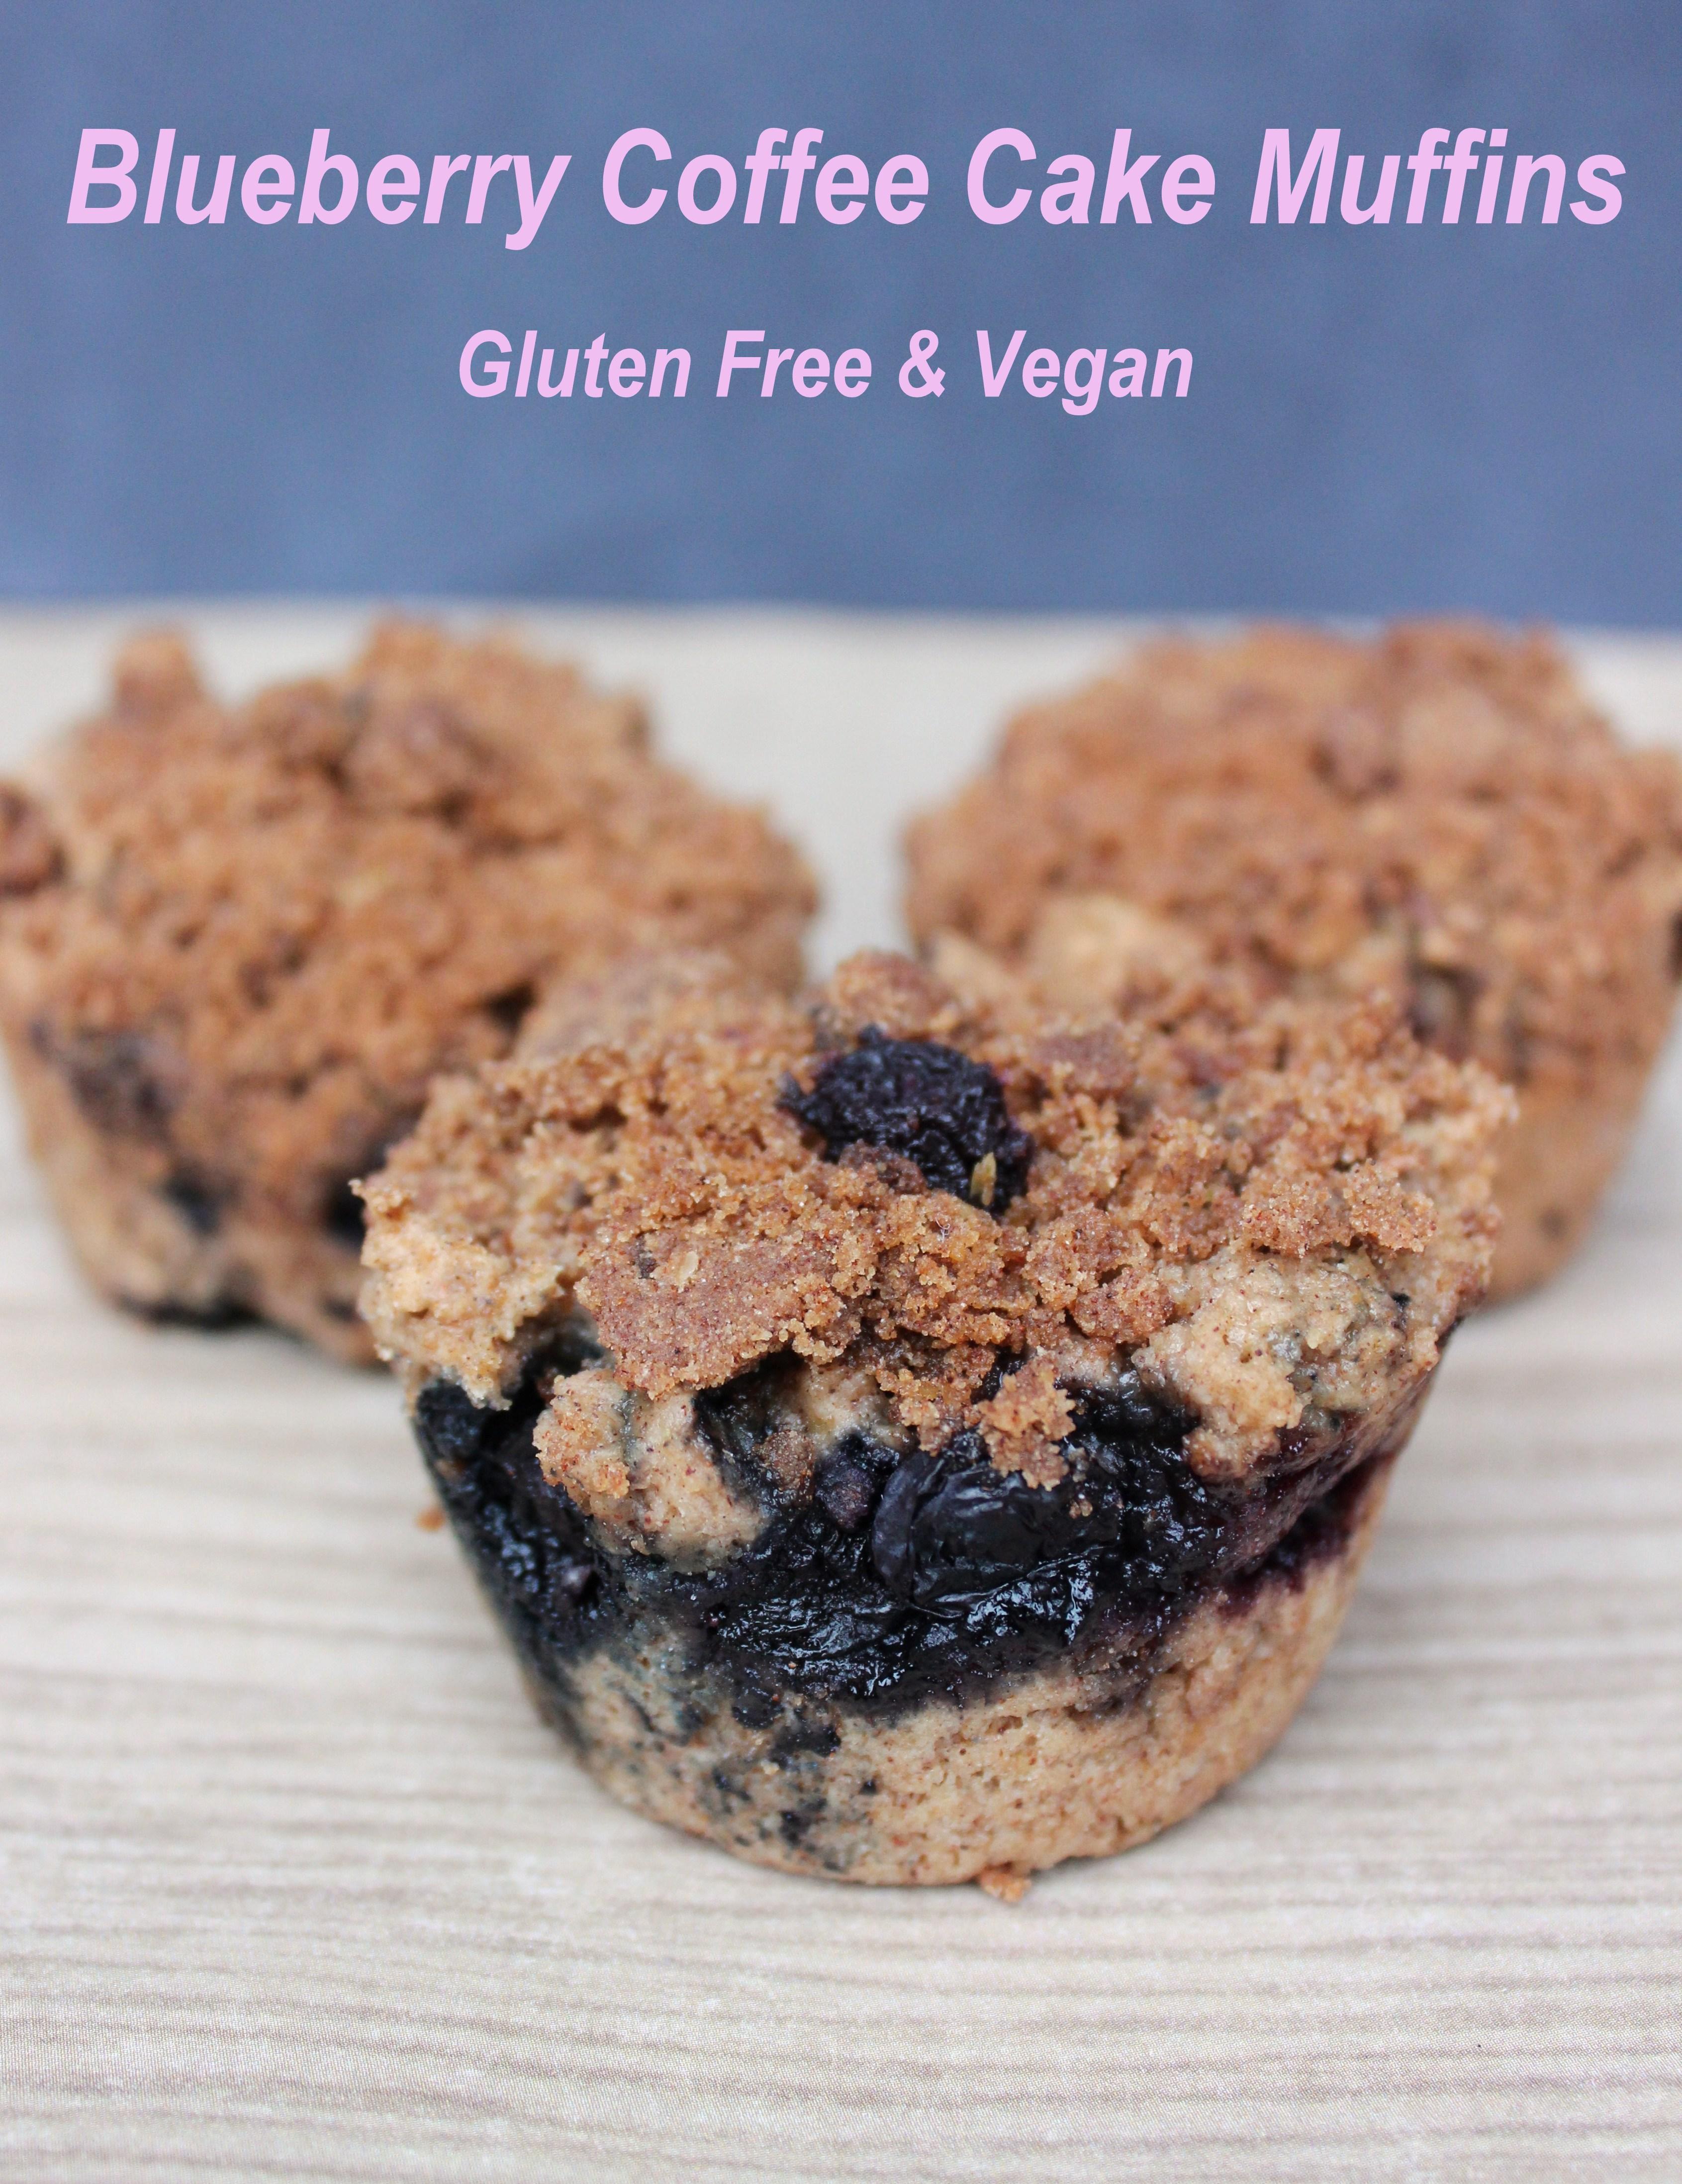 Blueberry Coffee Cake Muffins | Blissfulbritt